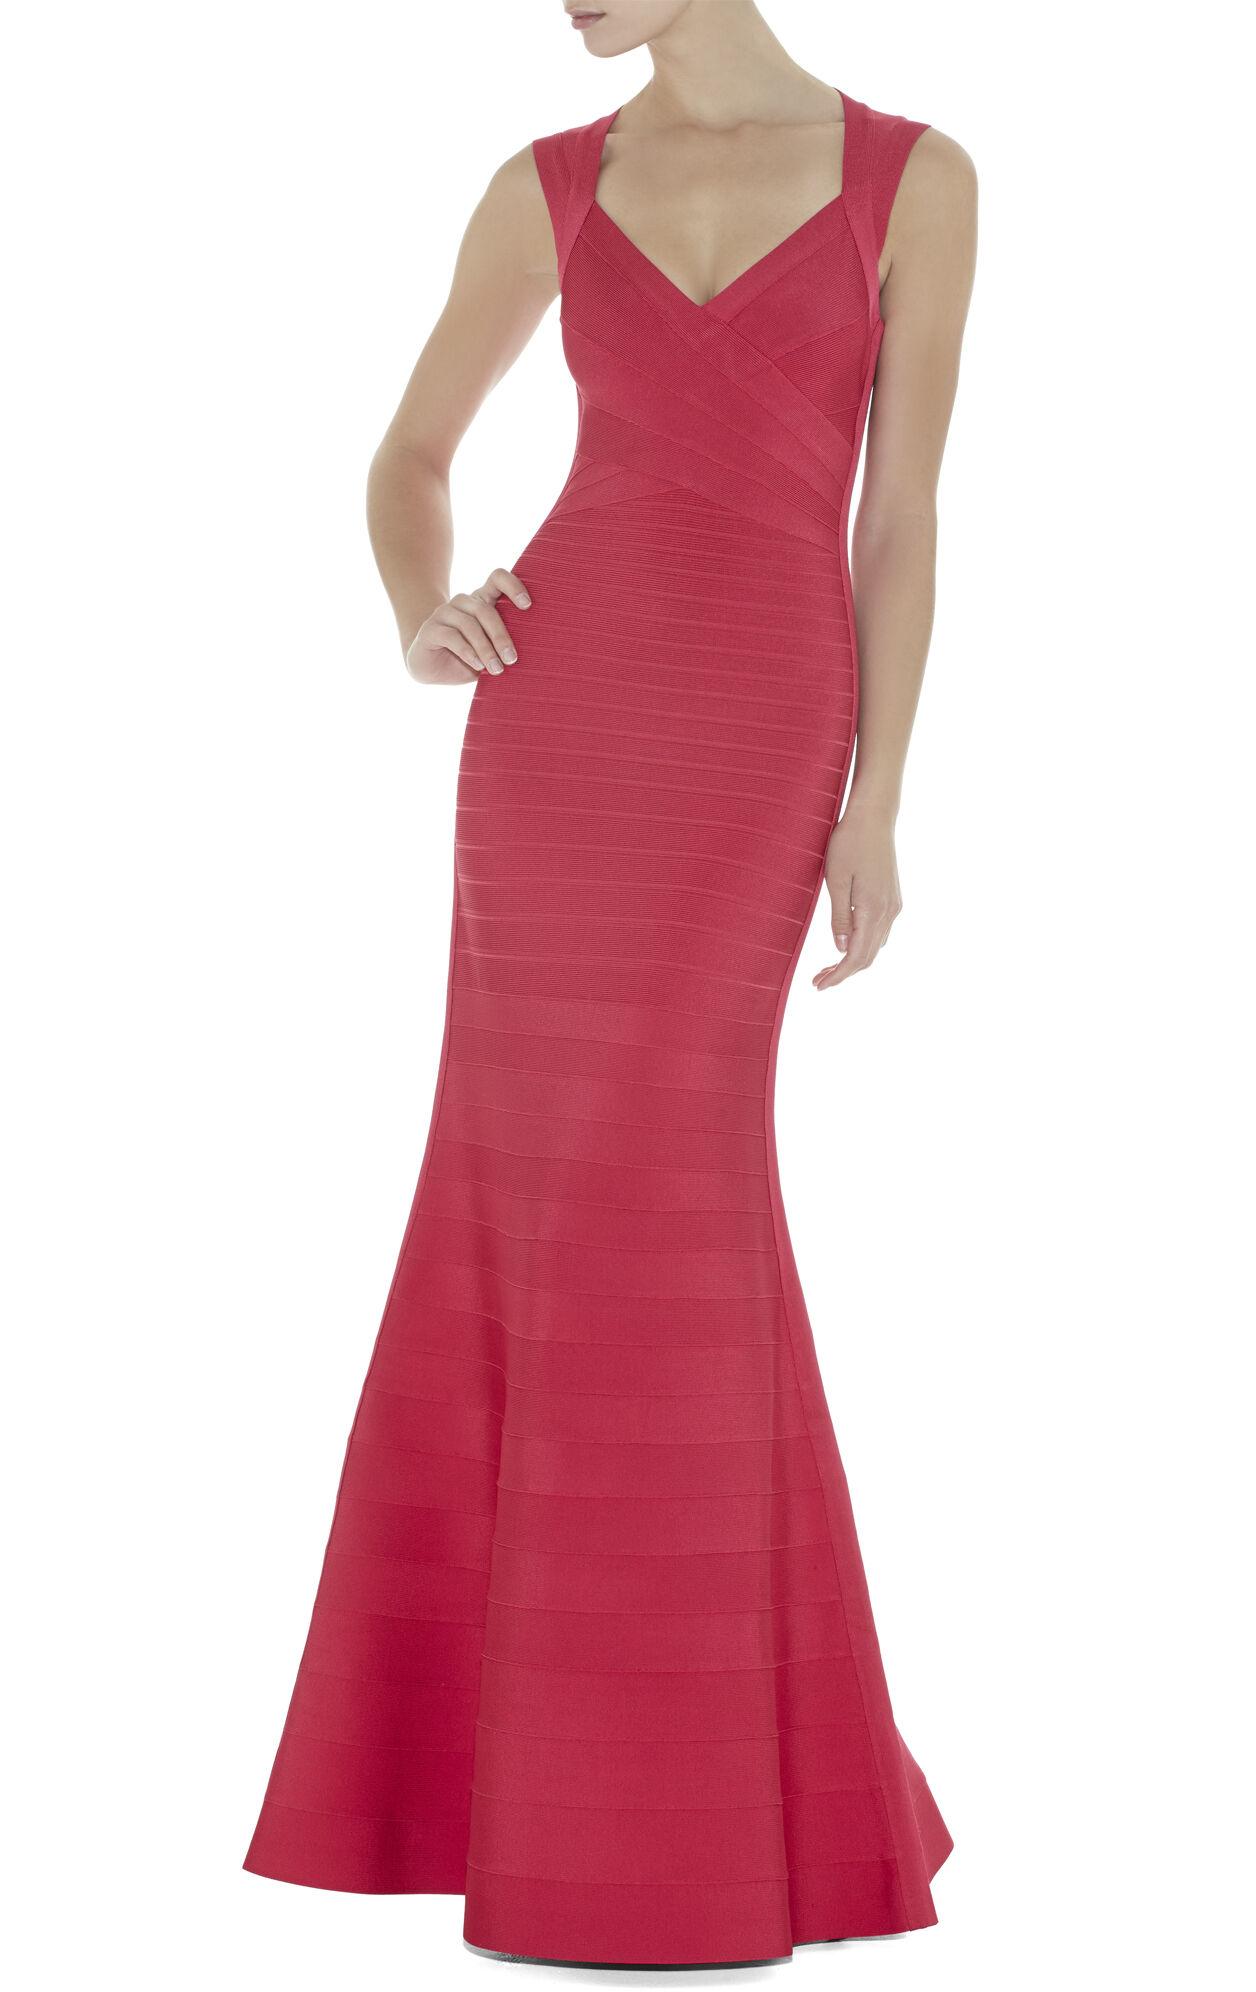 Camilla Signature Bandage Dress